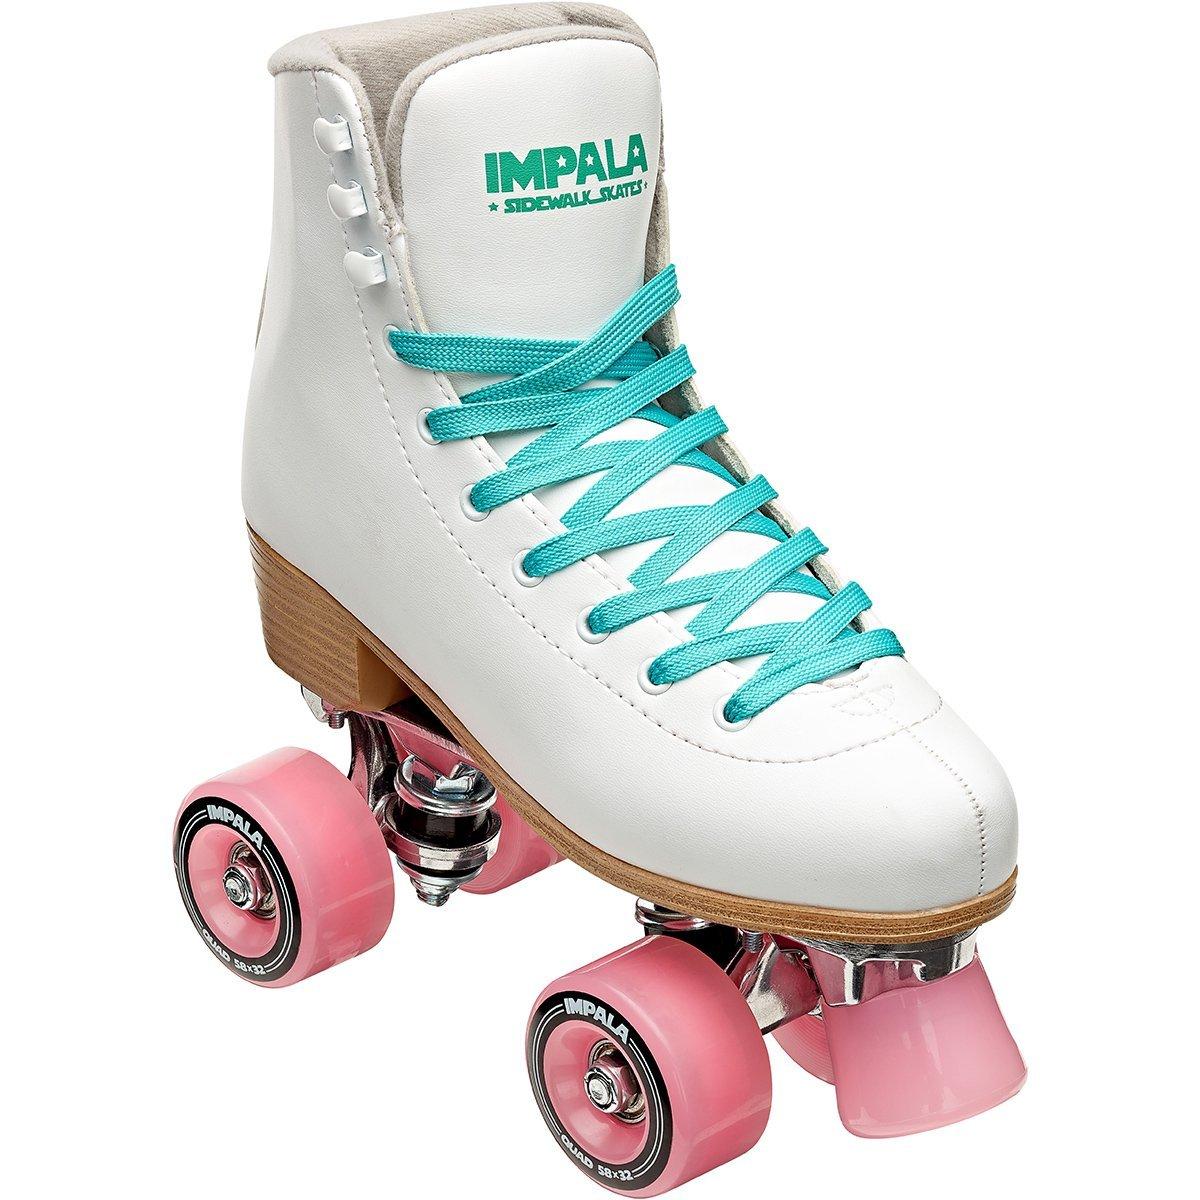 Impala Quad Roller Skates White